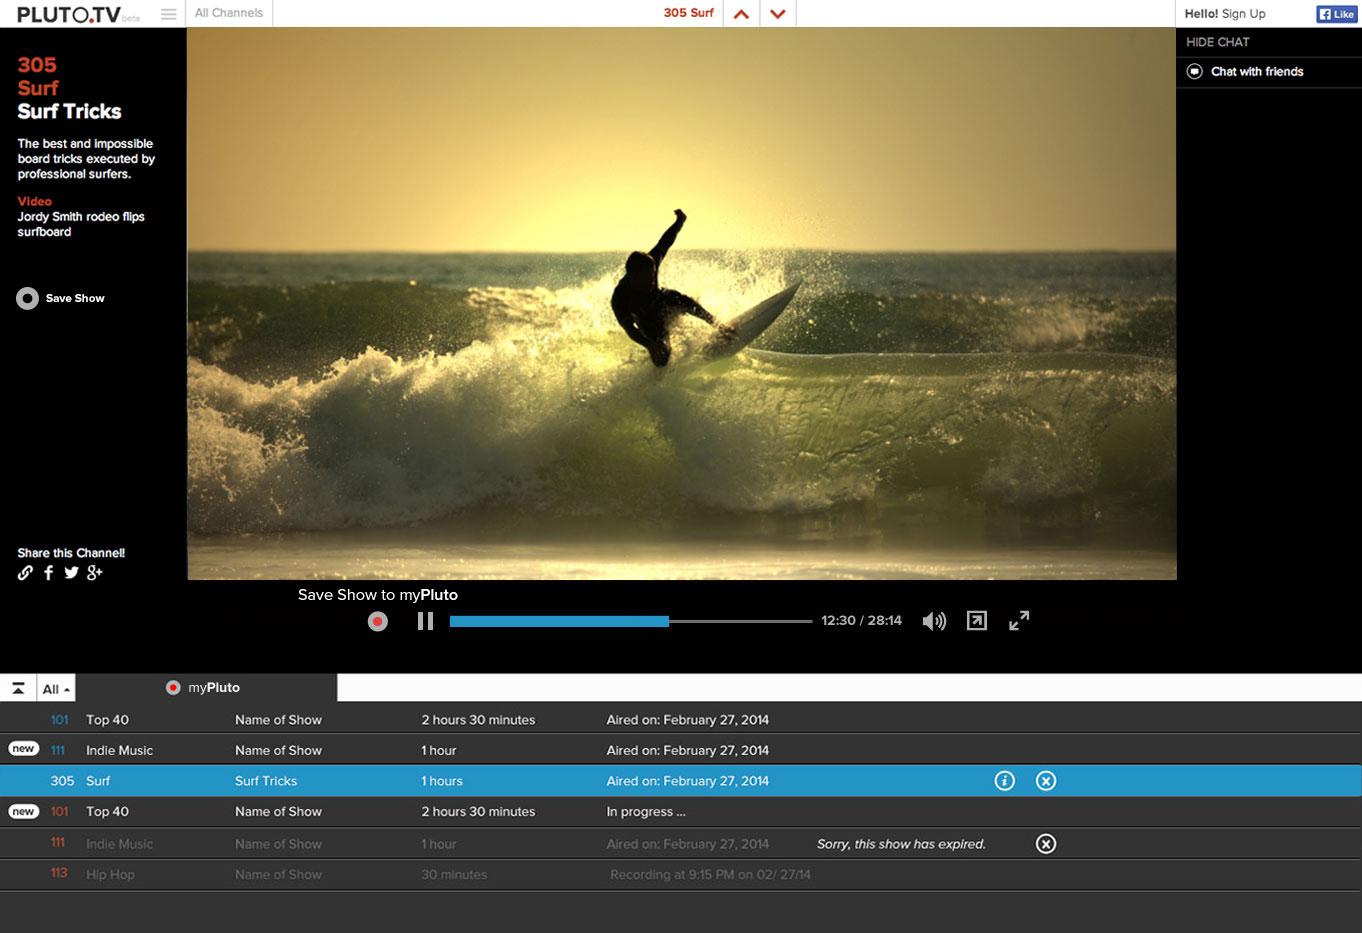 Web TV Service Pluto.TV Adds a DVR Feature